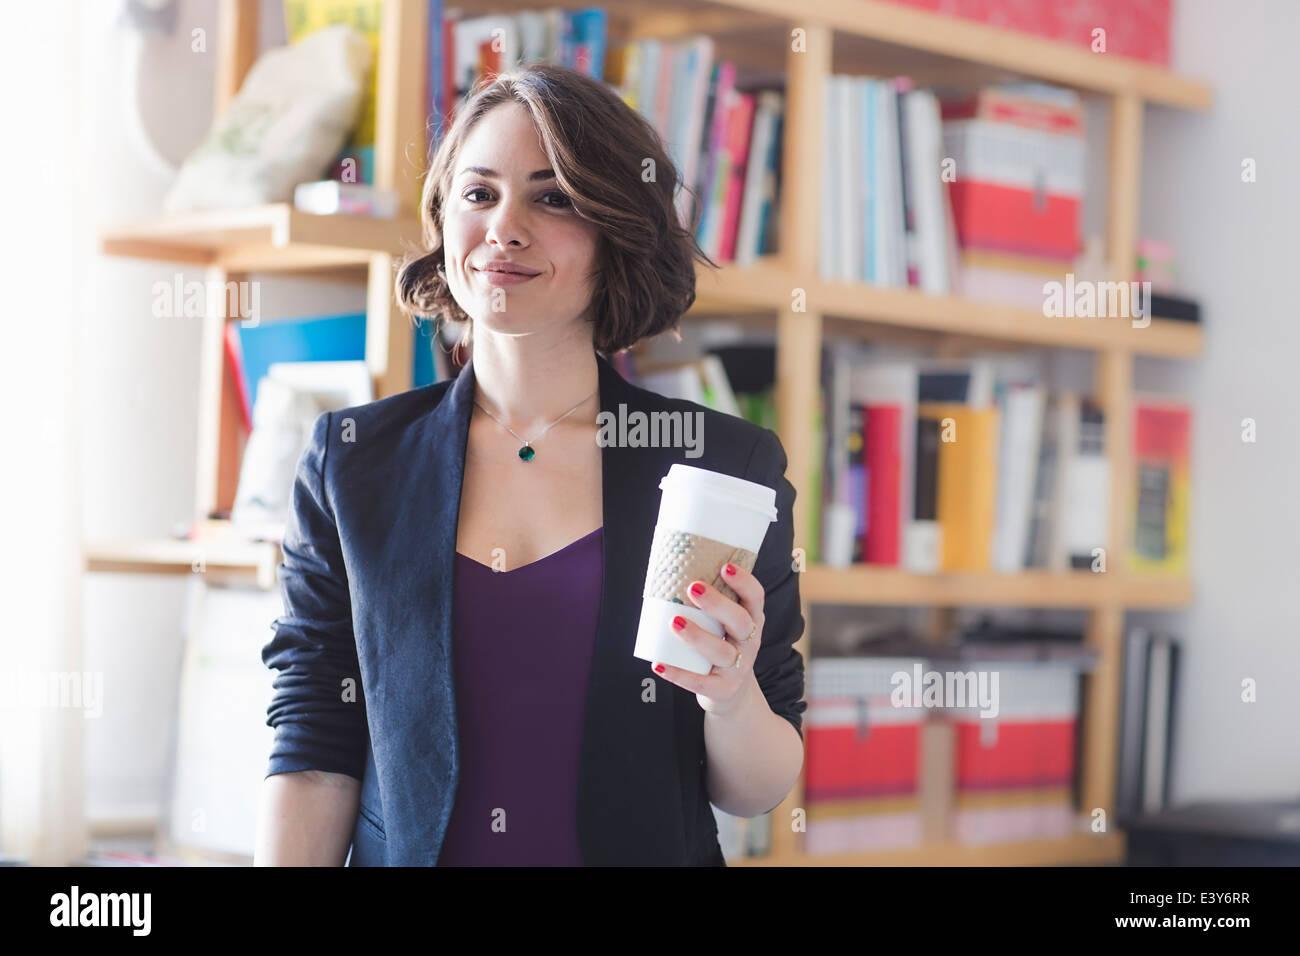 Take Break Coffeebreak : Young woman taking coffee break stock photo  alamy